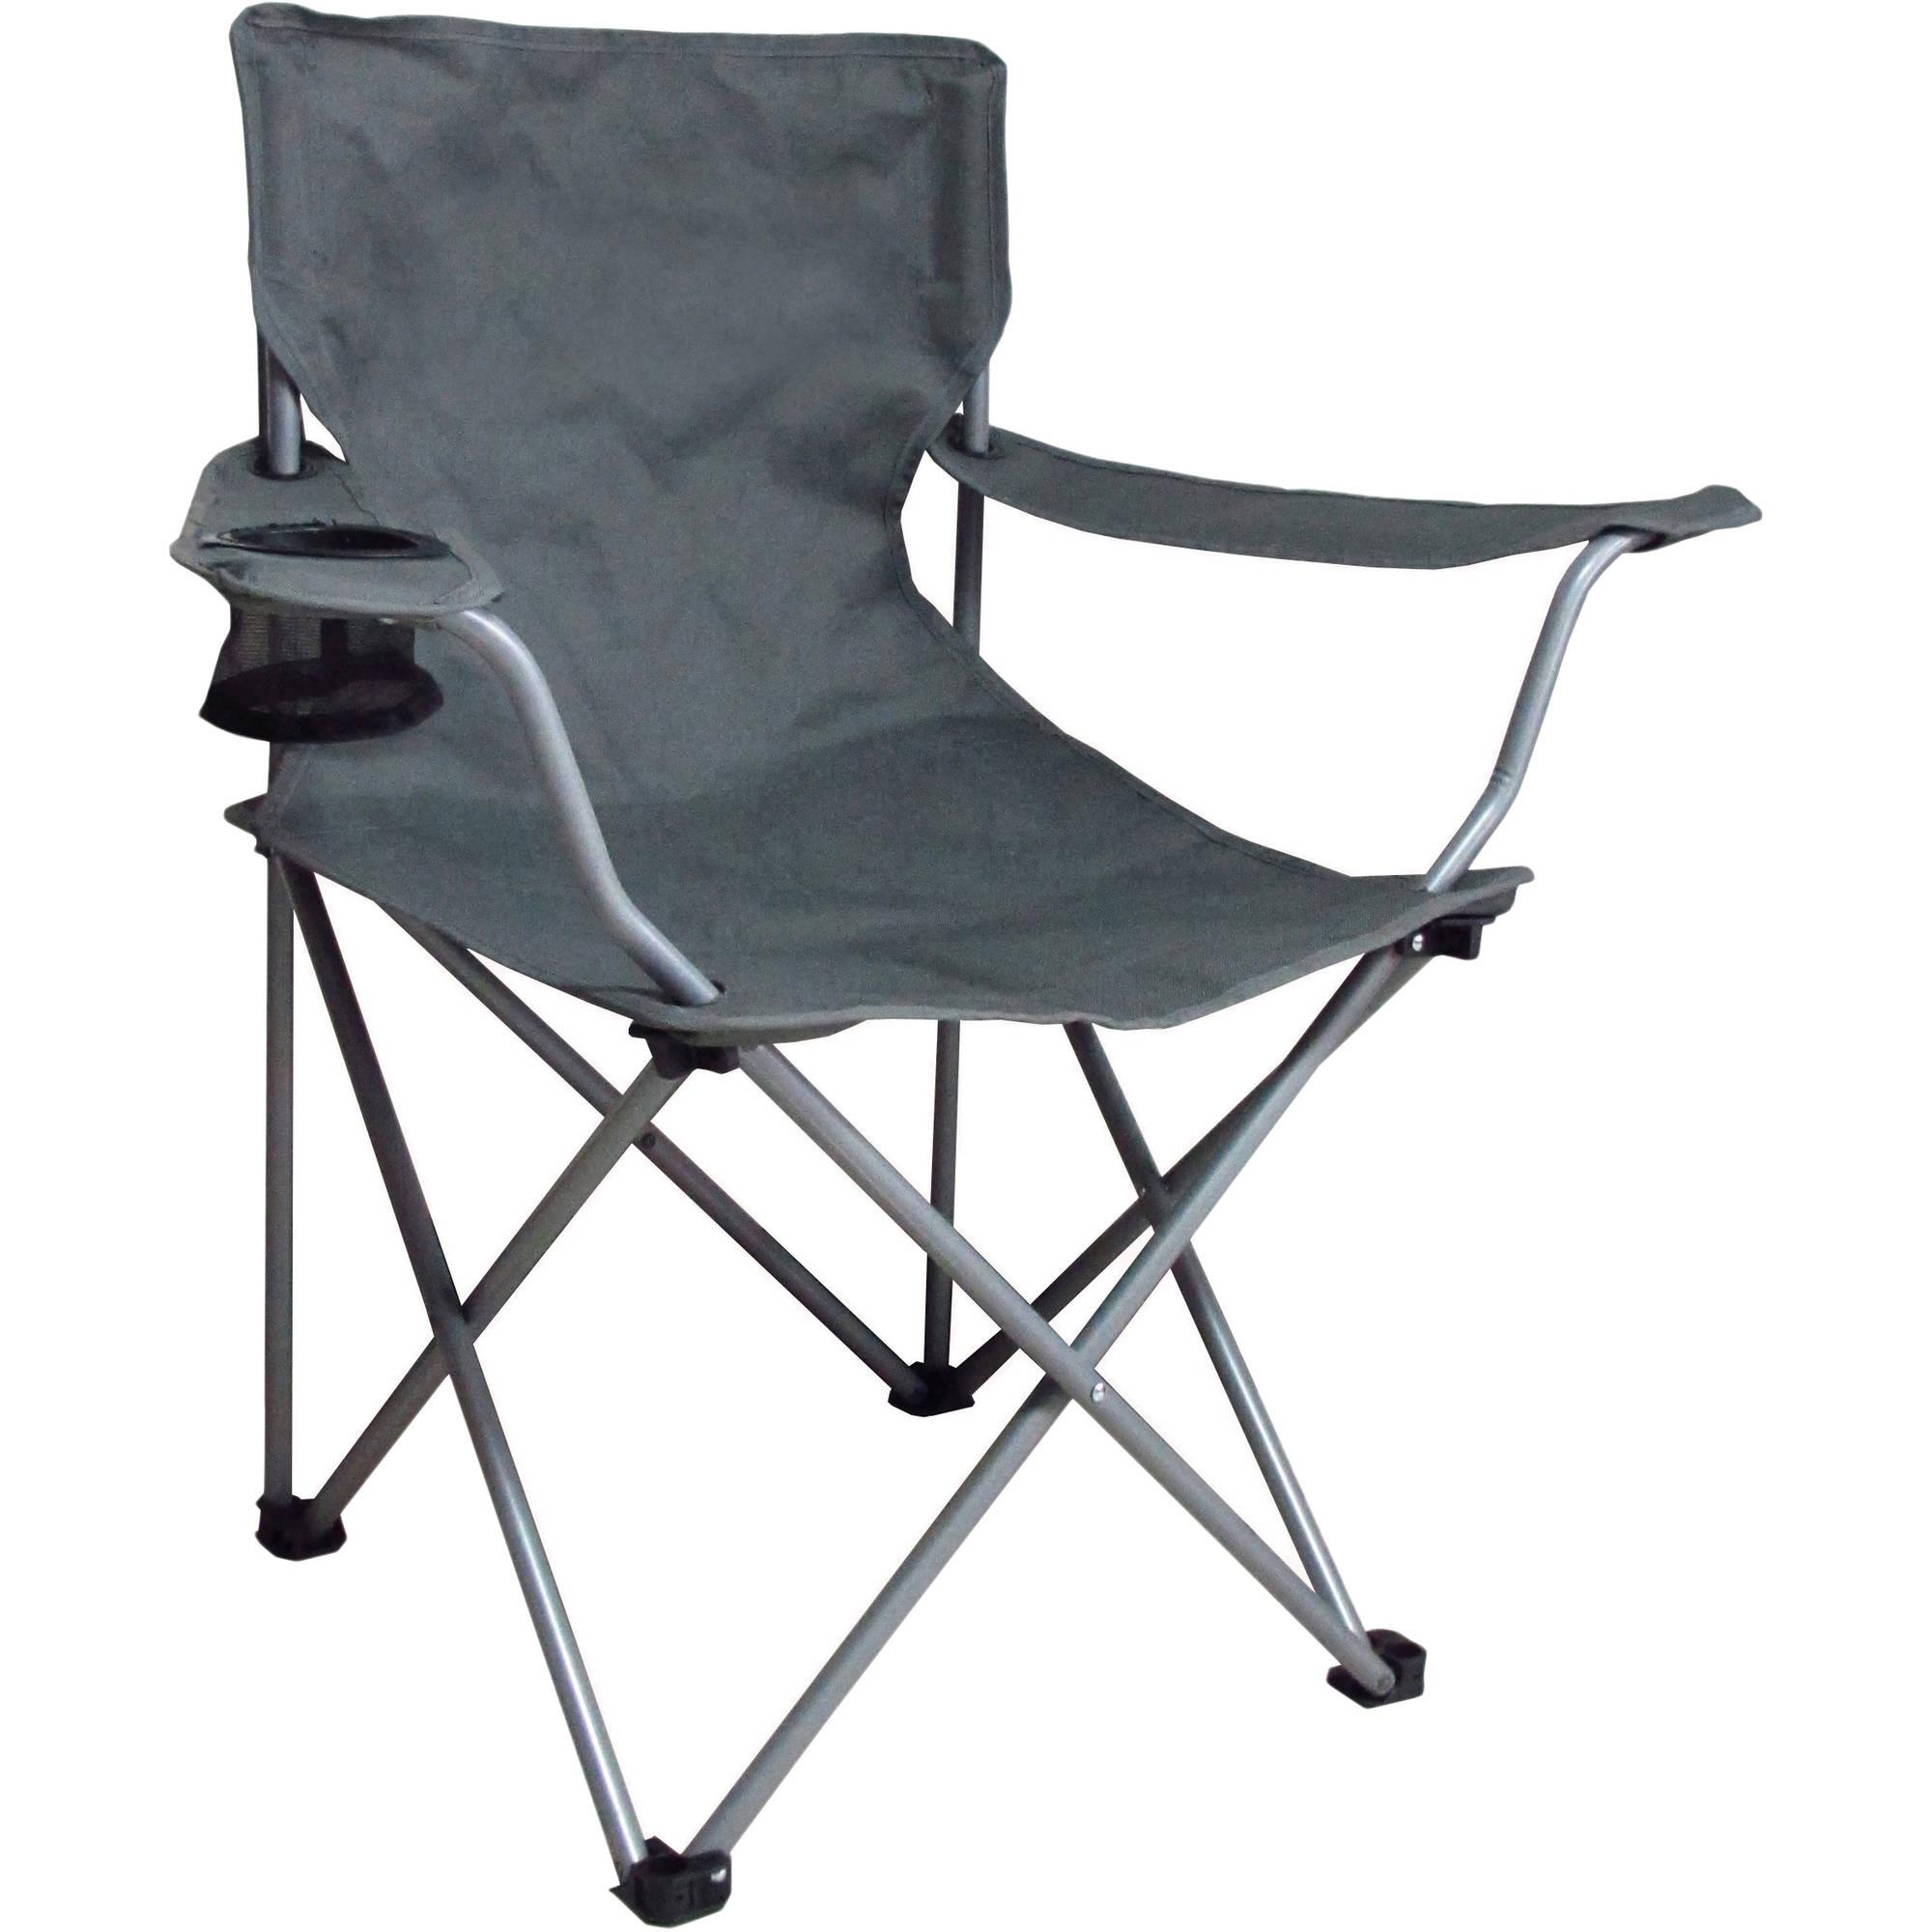 folding chairs ozark trail folding chair - walmart.com SDEVSMU